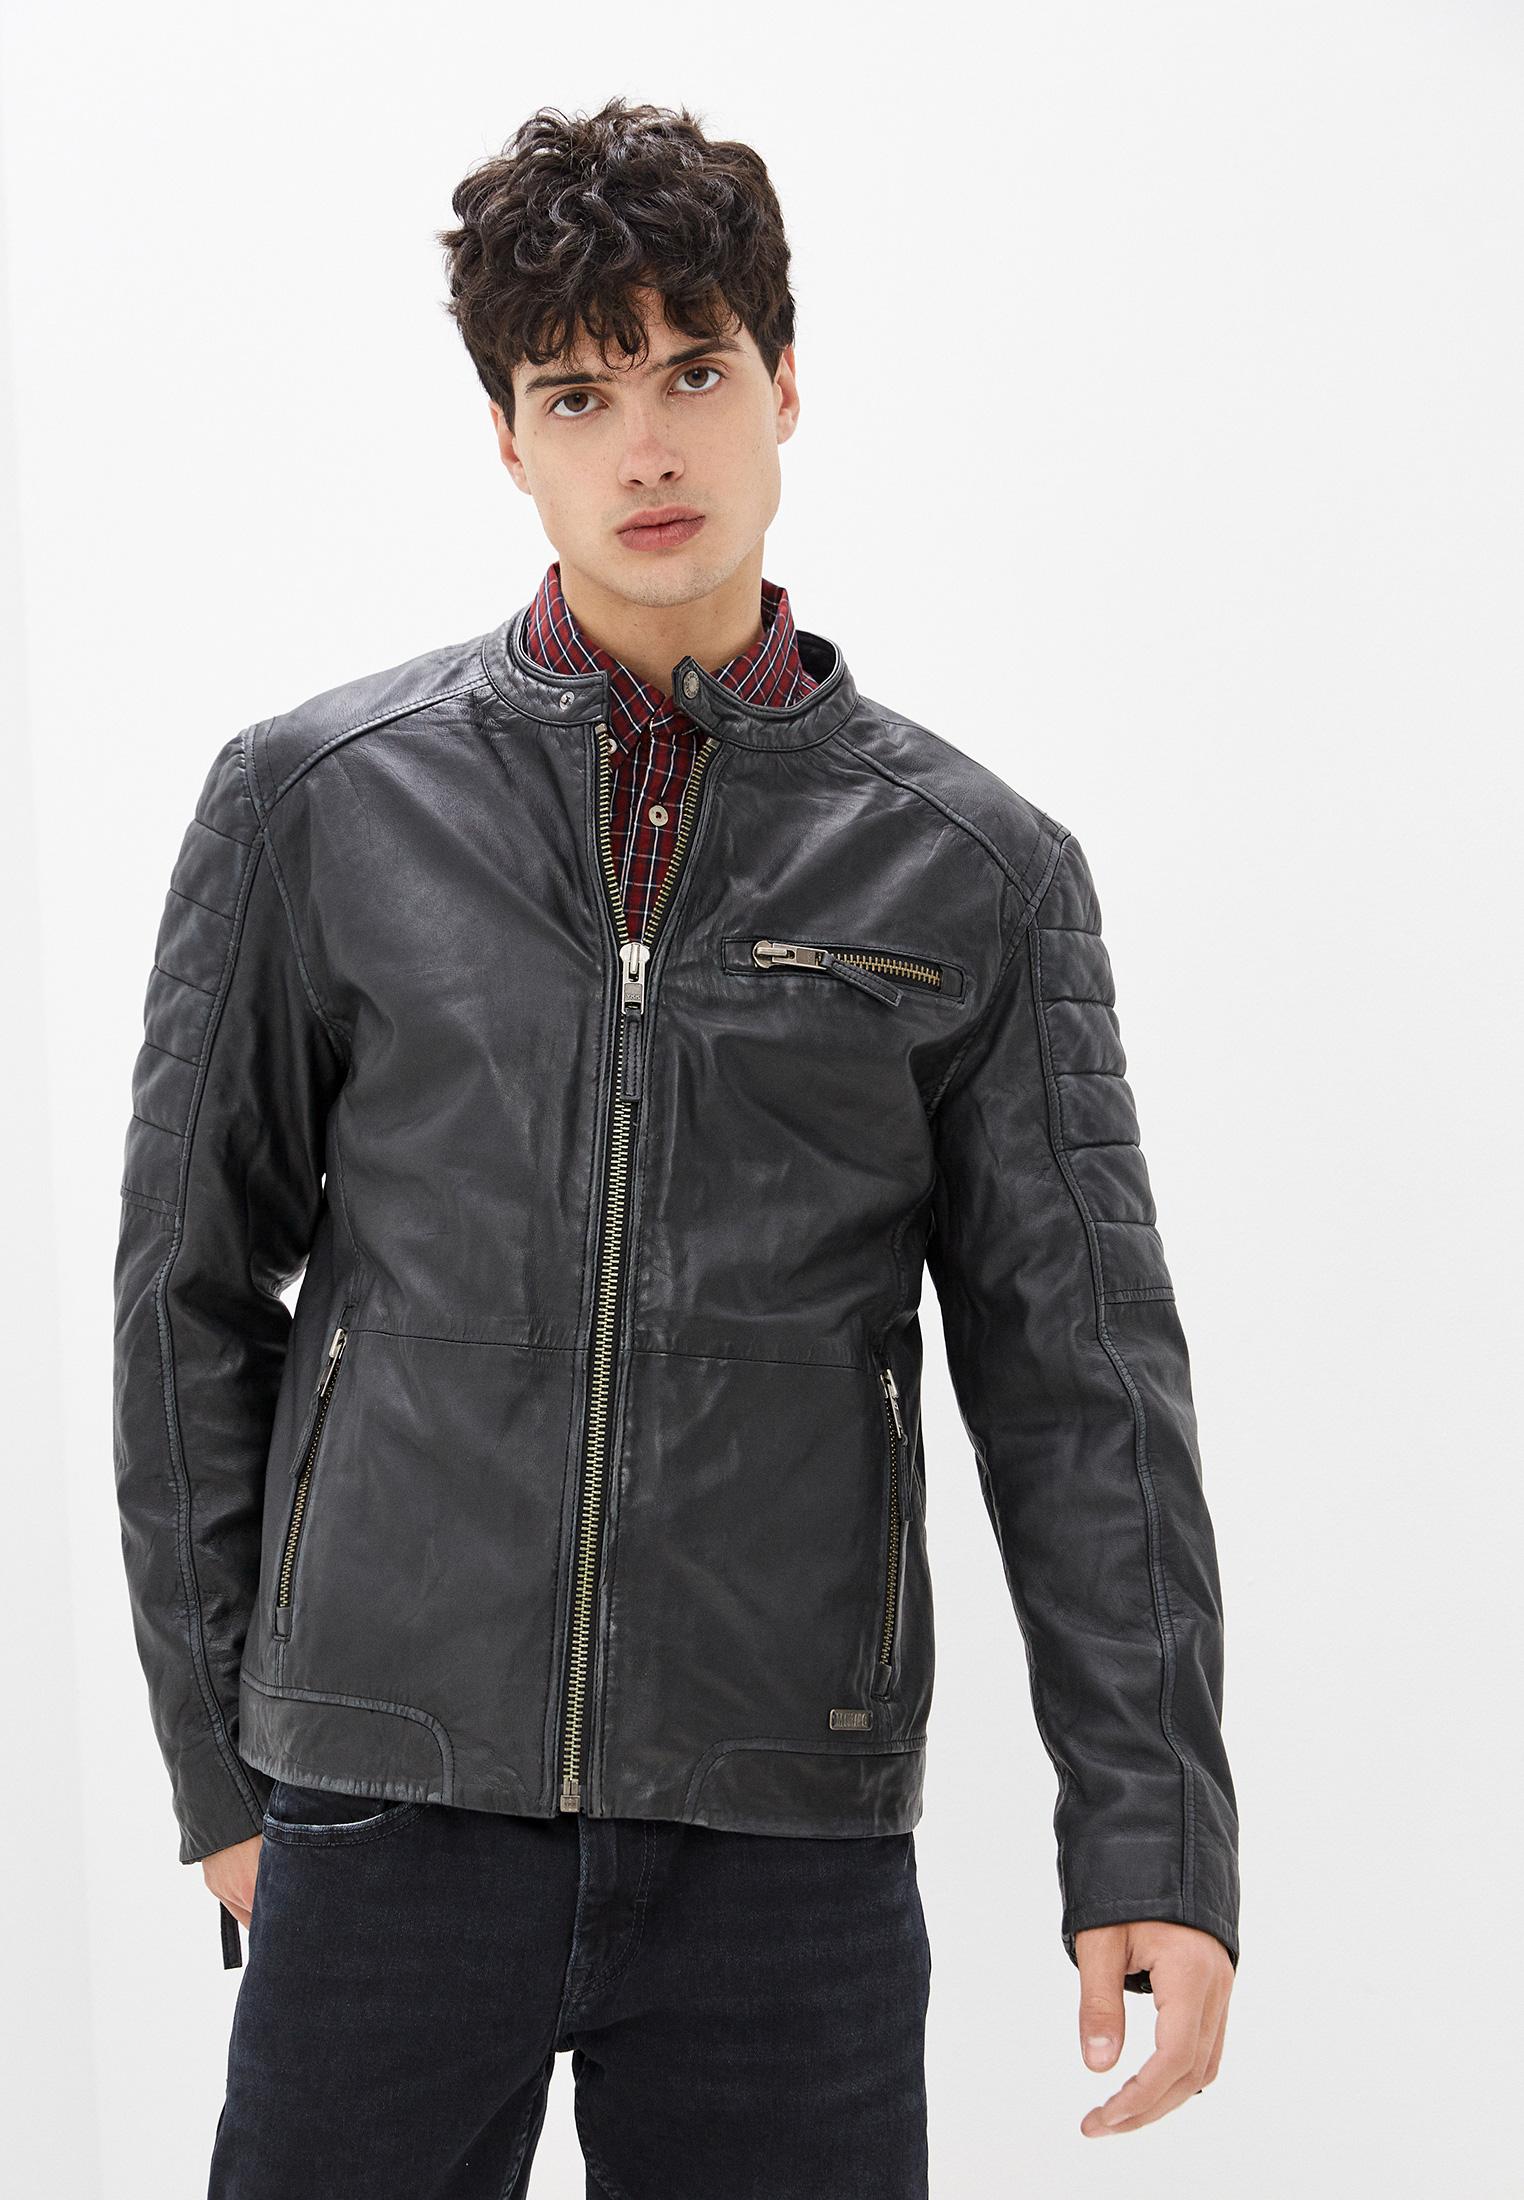 Кожаная куртка Mustang Куртка кожаная Mustang